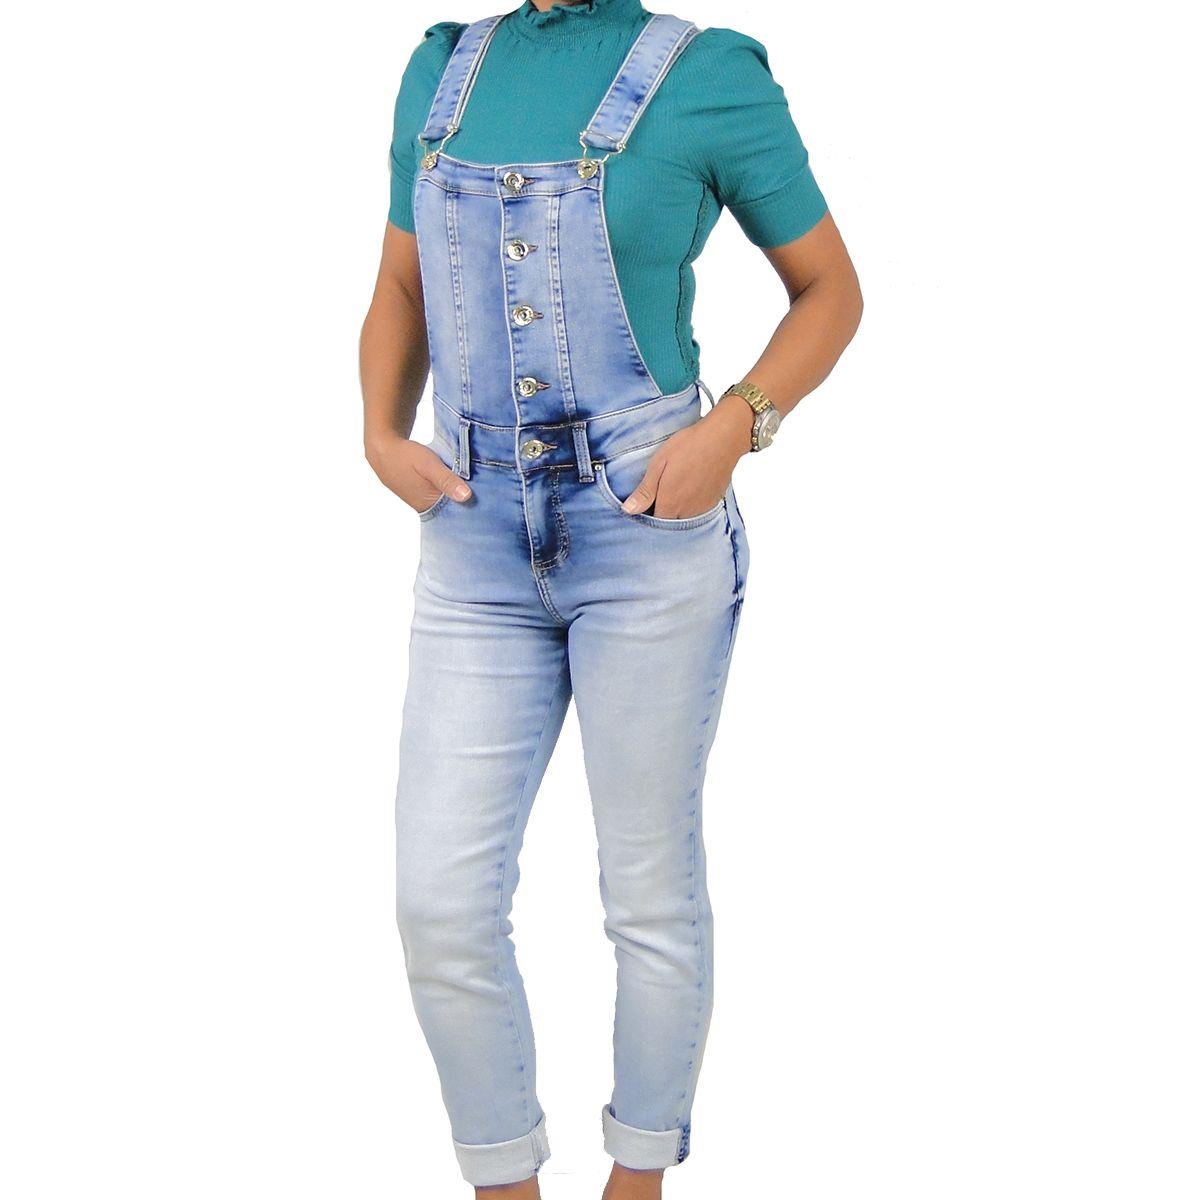 Jardineira Ilicito Botões  Jeans Claro